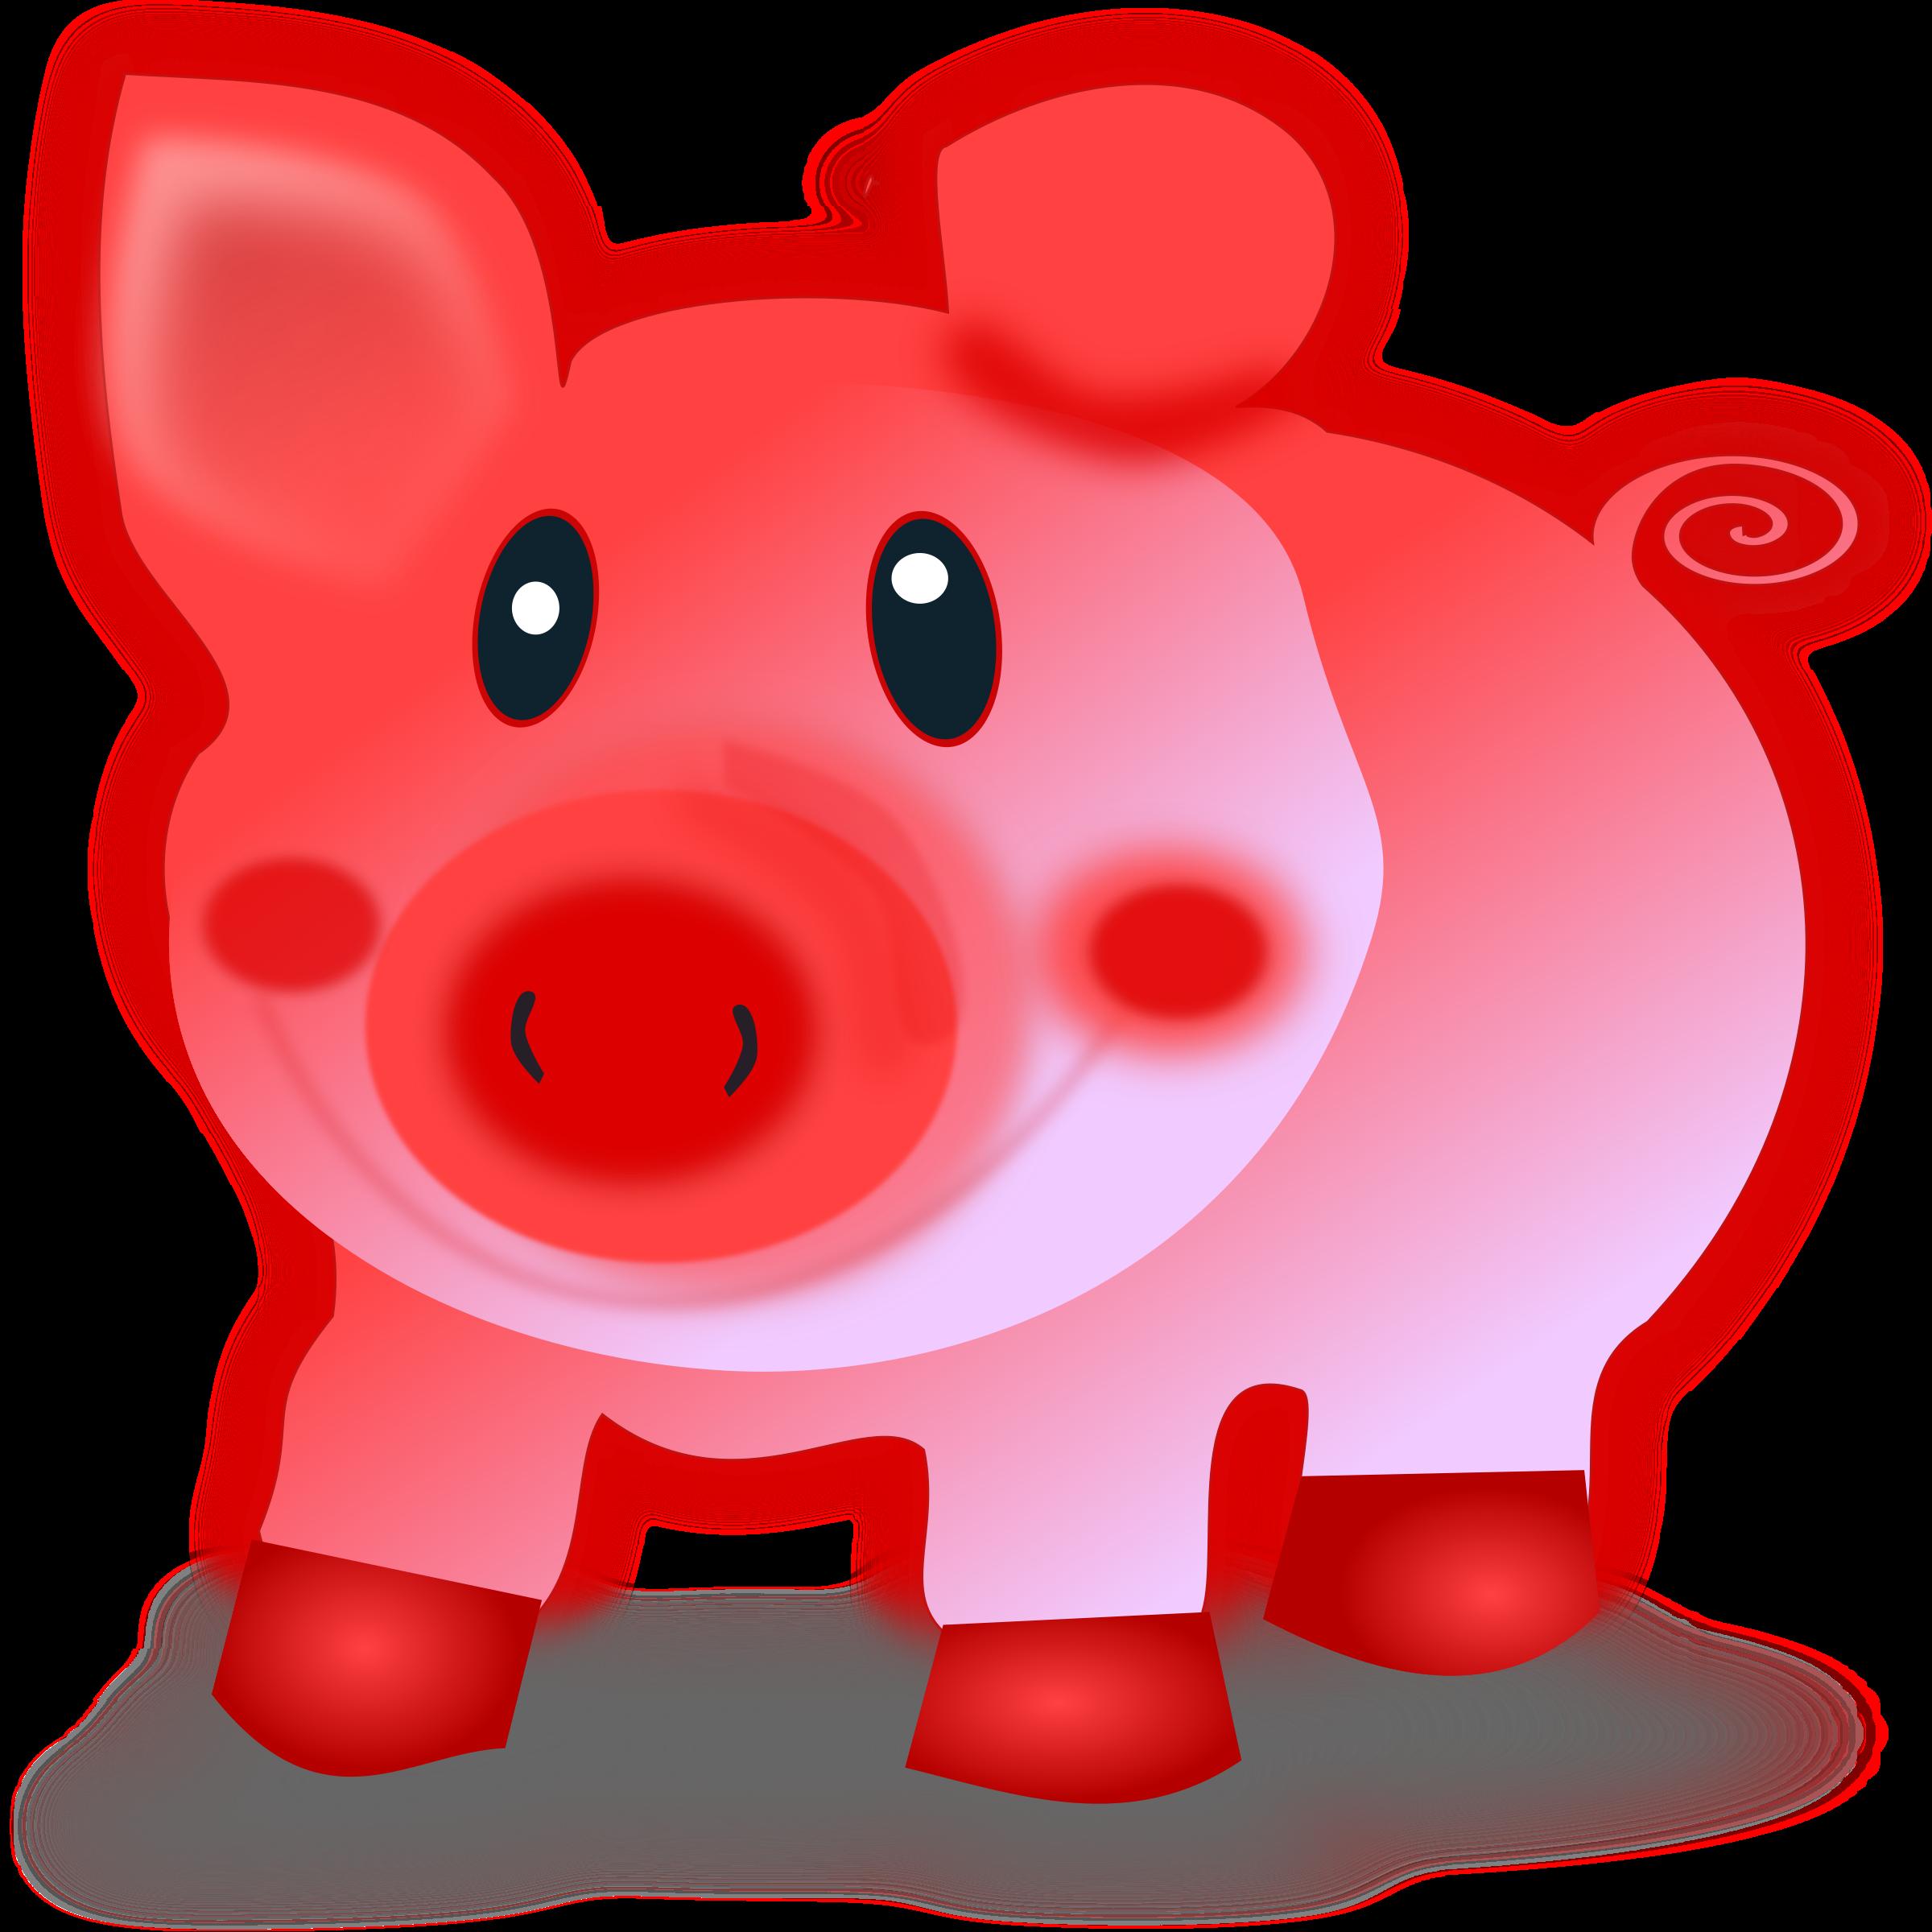 Pig clipart domestic animal. Piglet big image png